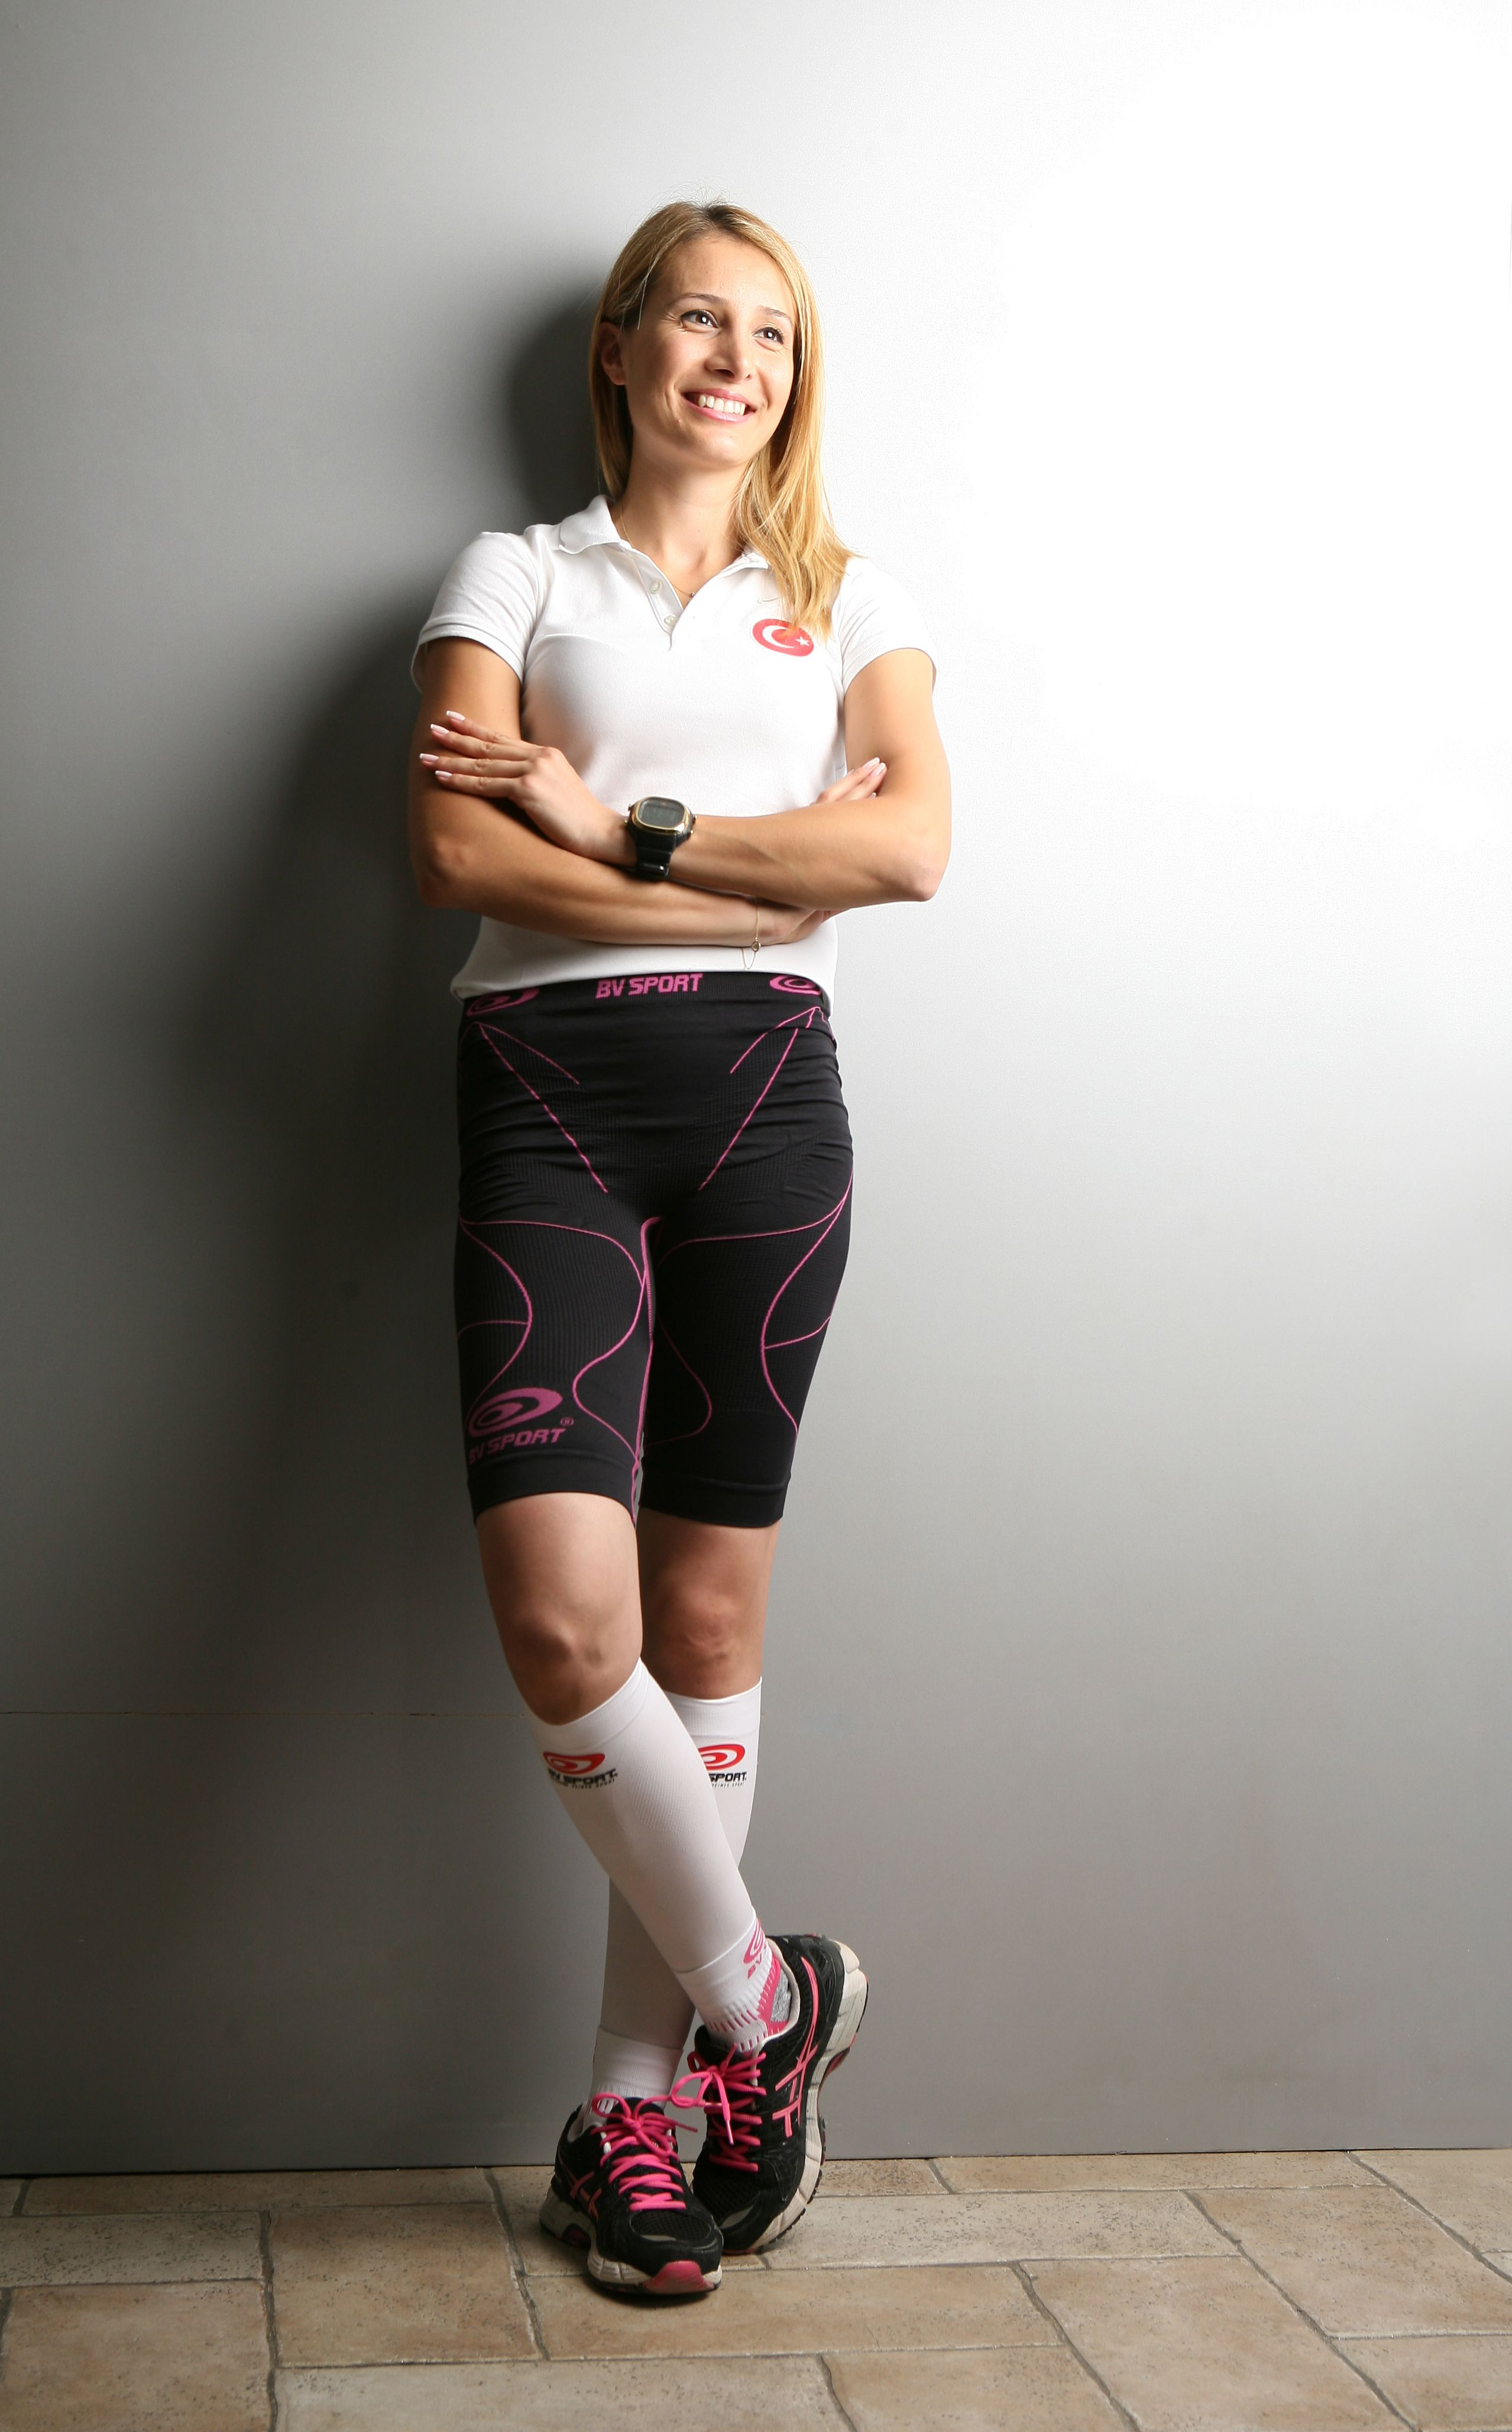 CUISSARD FEMINA BV Sport